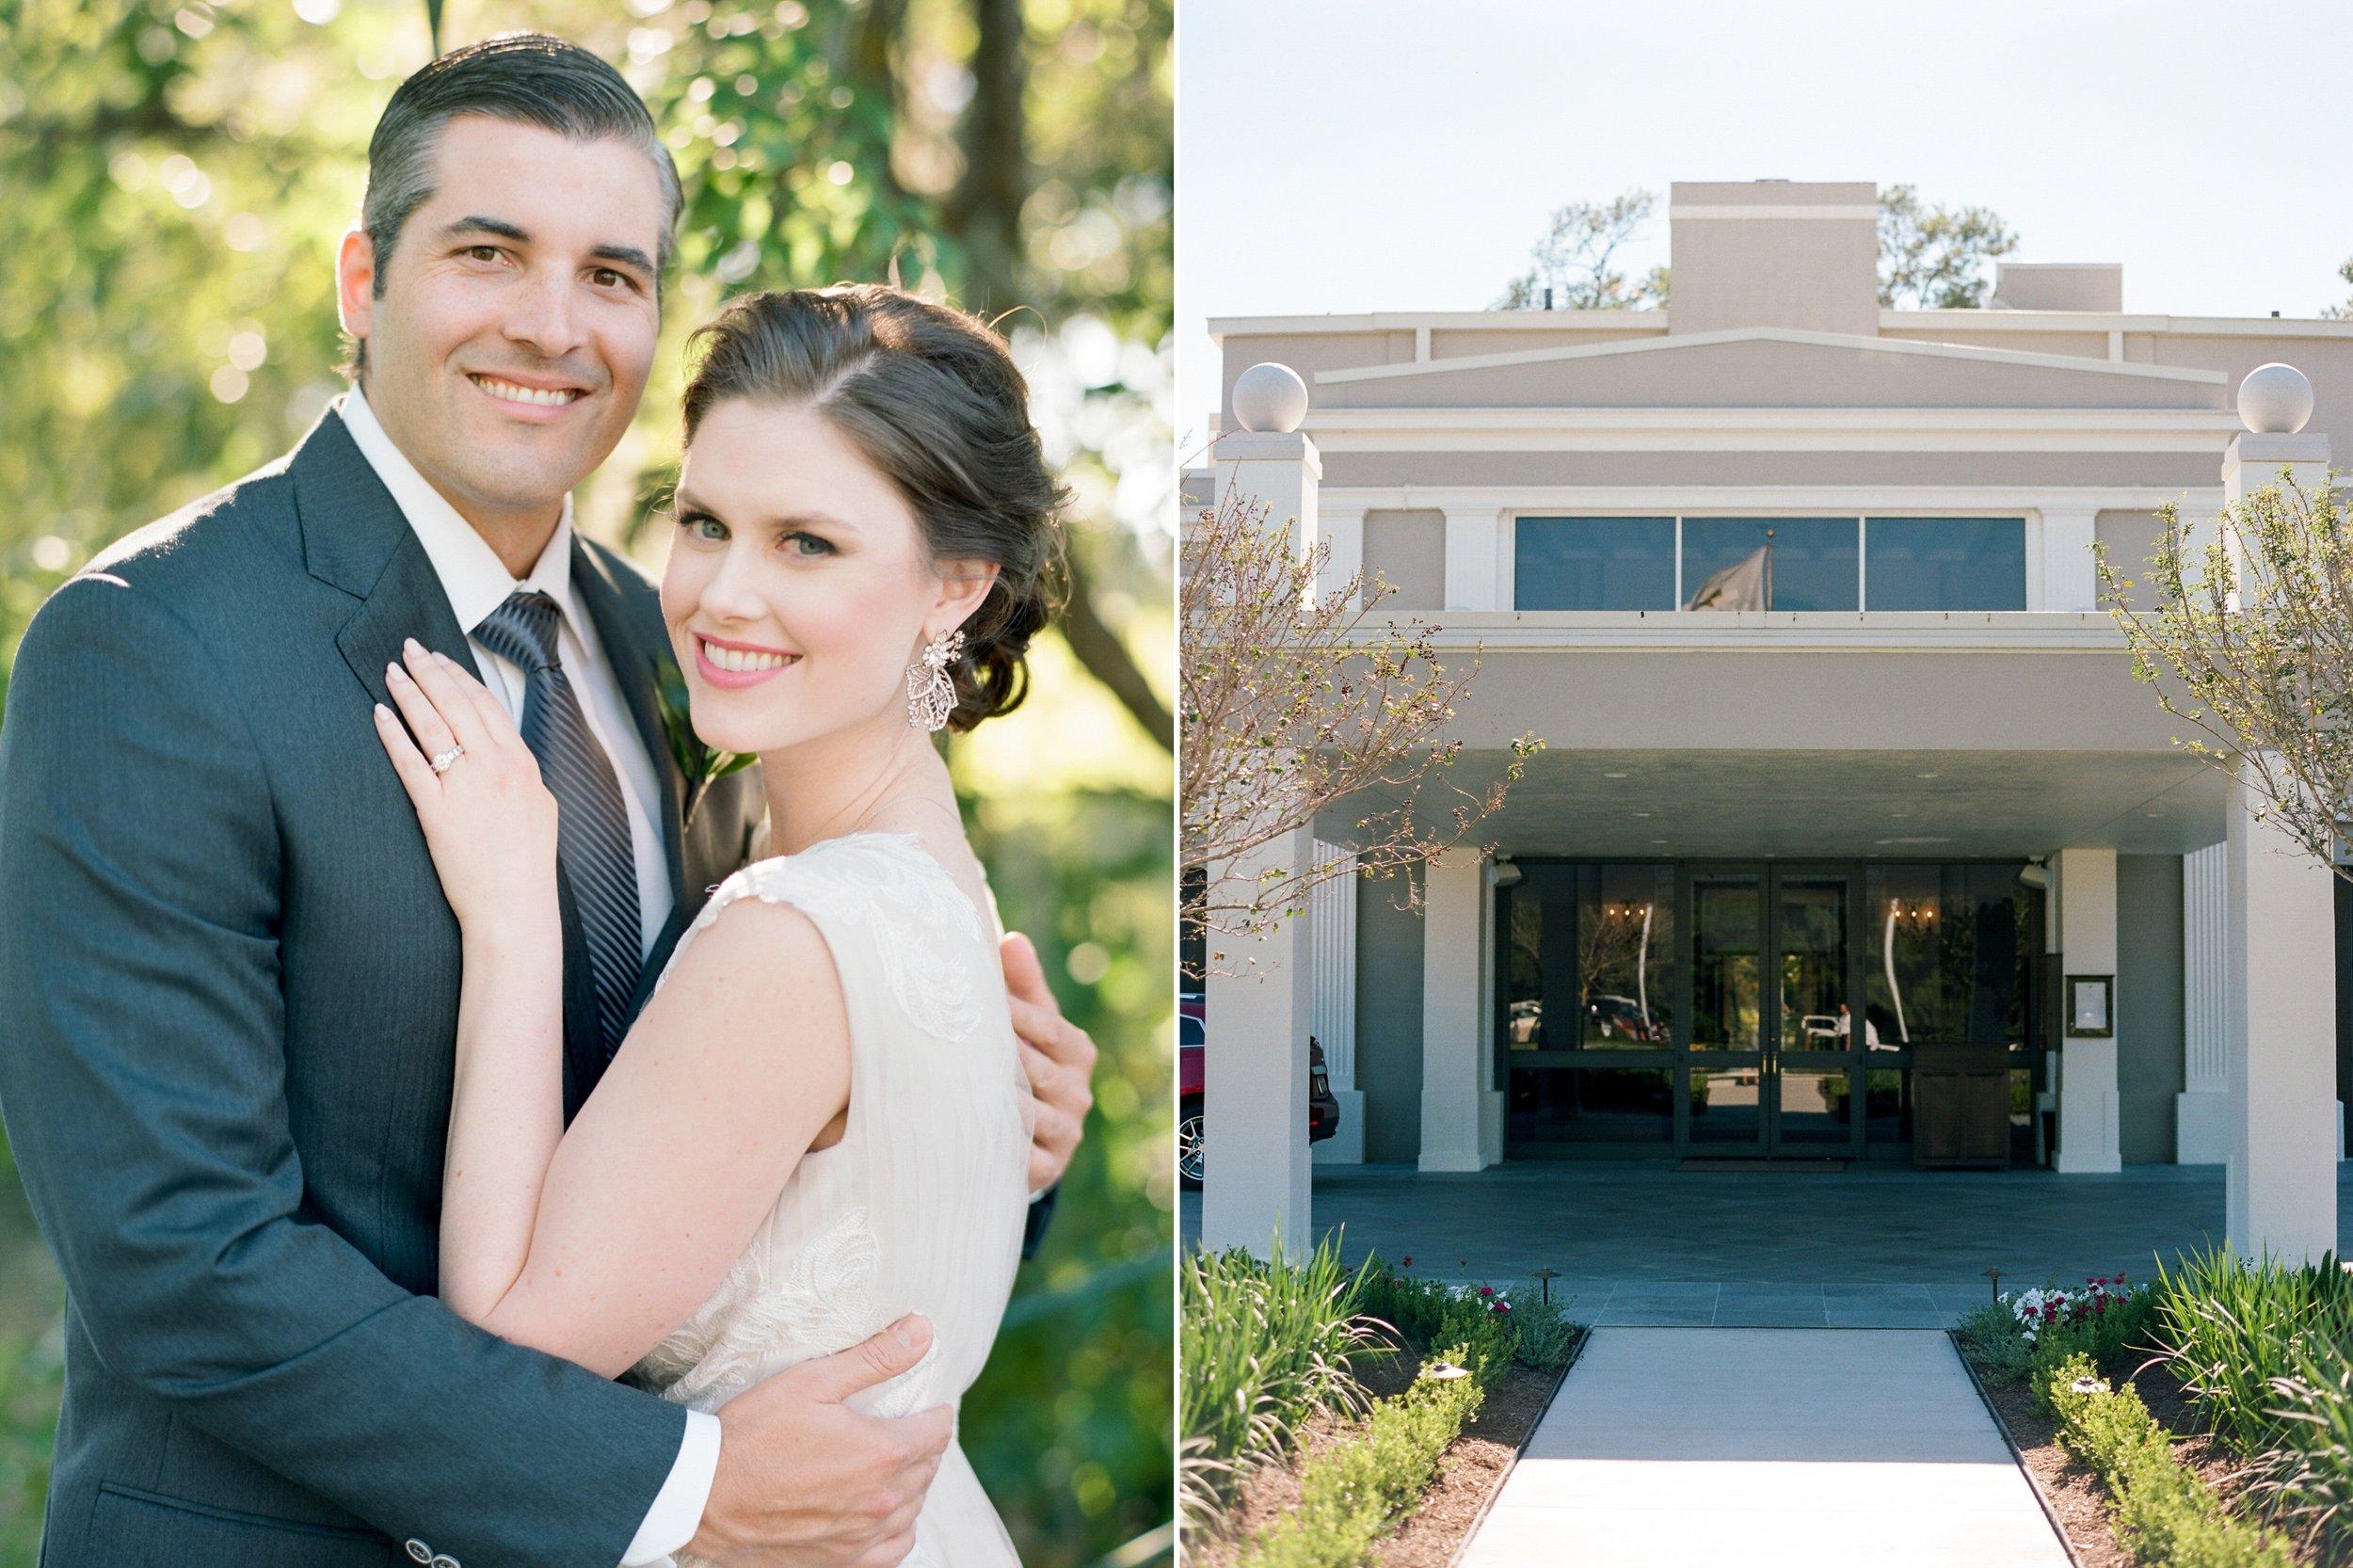 Houston-Wedding-Photographer-Lakeside-Country-Club-First-Look-Bride-Groom-Formals-Film-Fine-Art-Photography-493.jpg